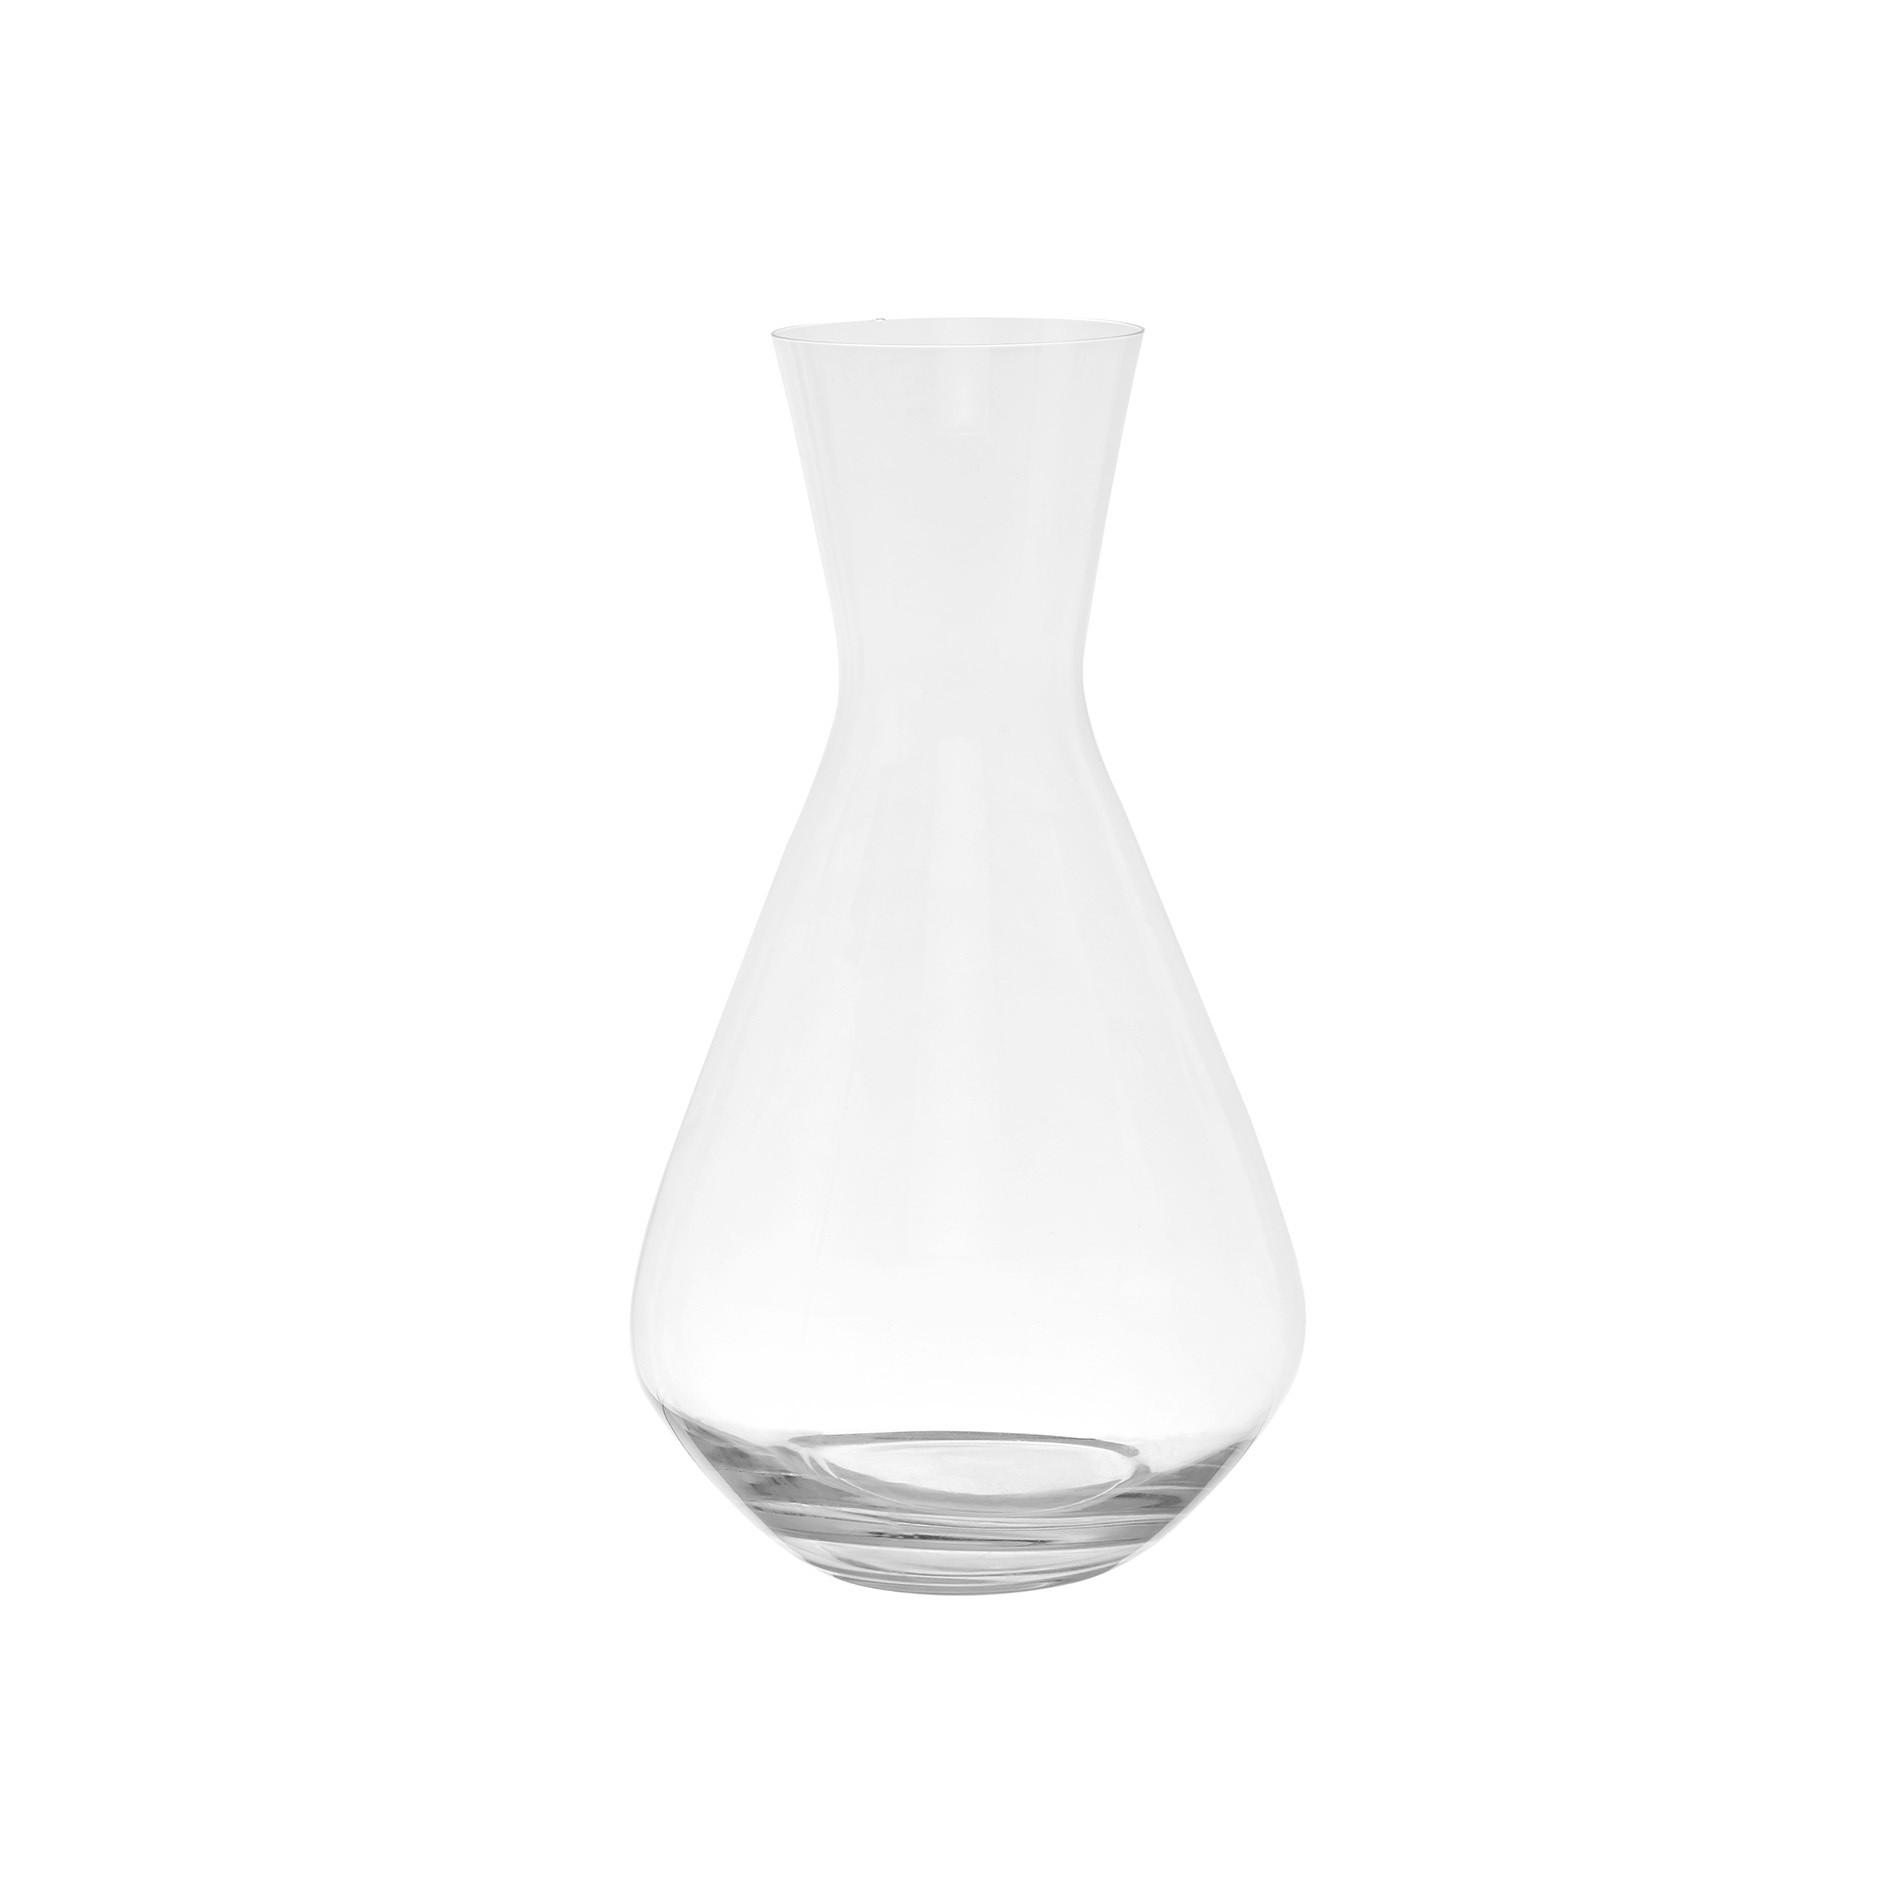 Decanter cristallo di Bohemia, Trasparente, large image number 0